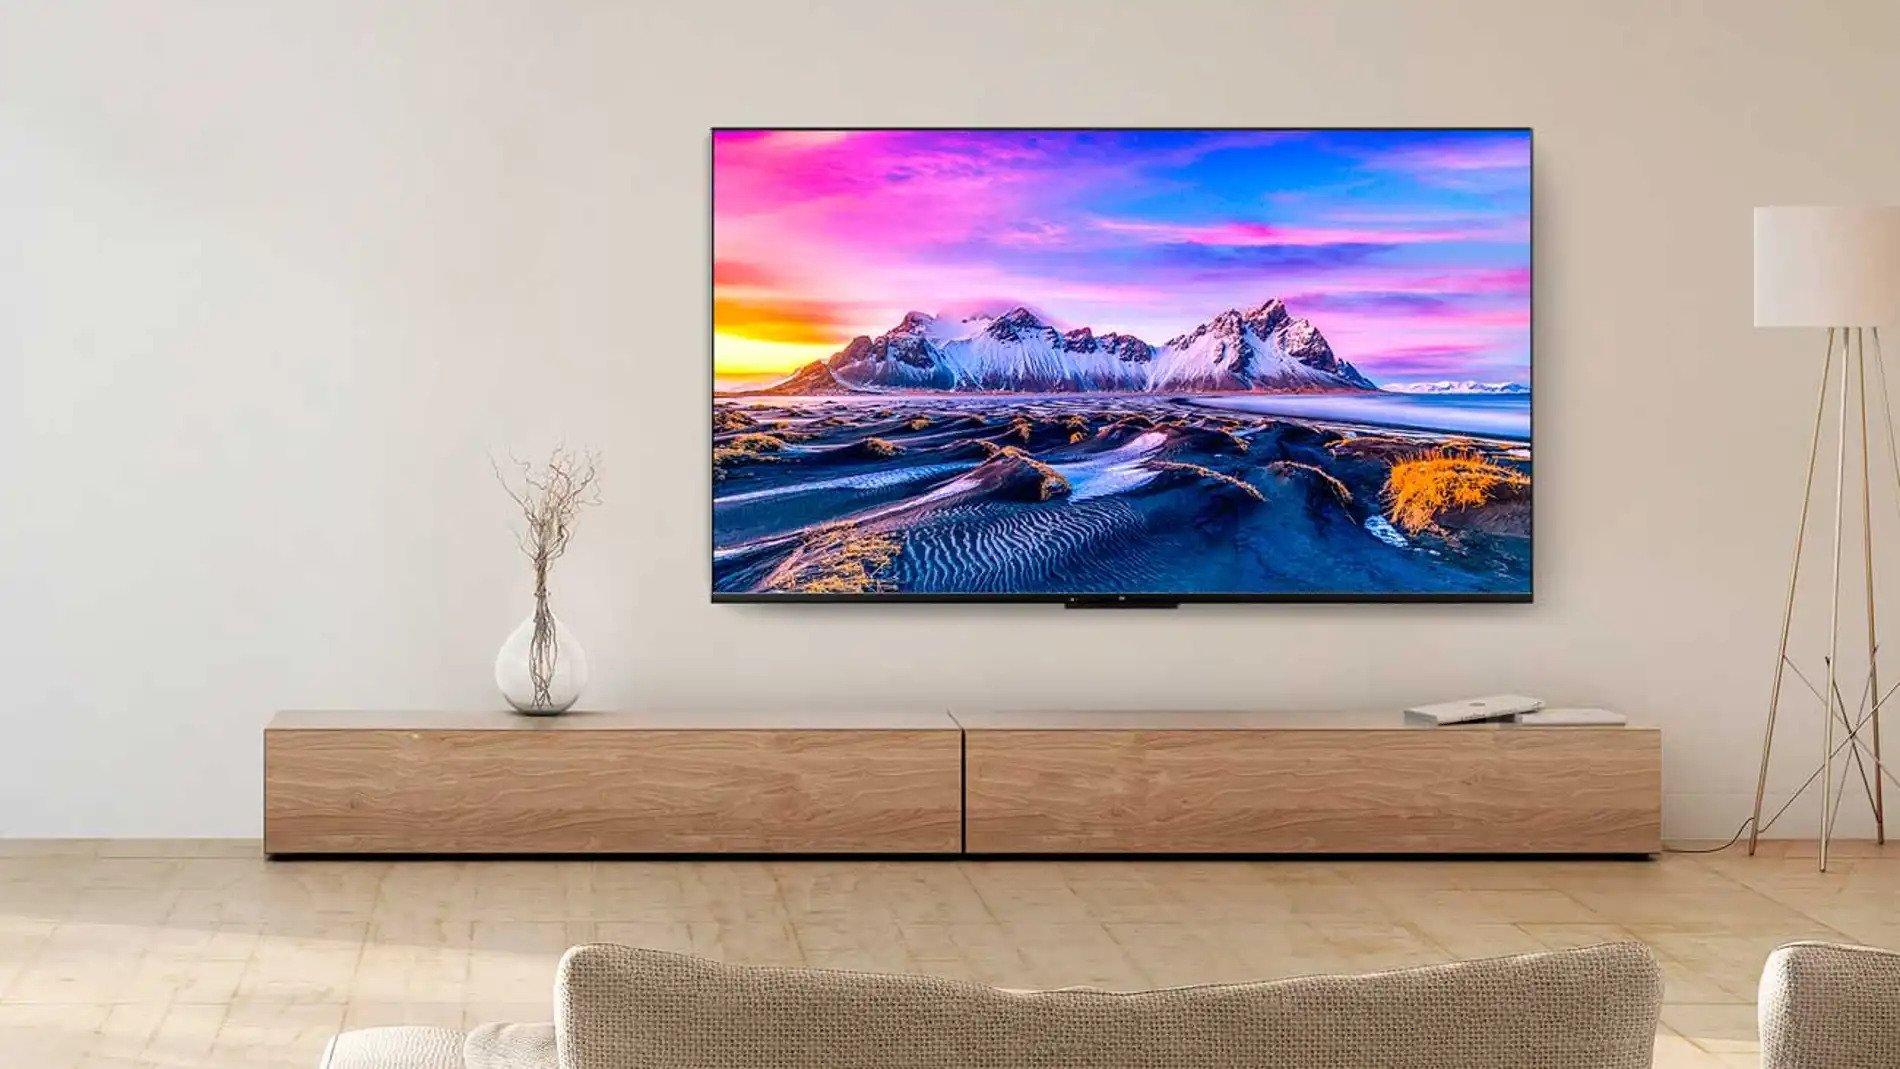 Migliori Televisori Oled Led Qled LCD